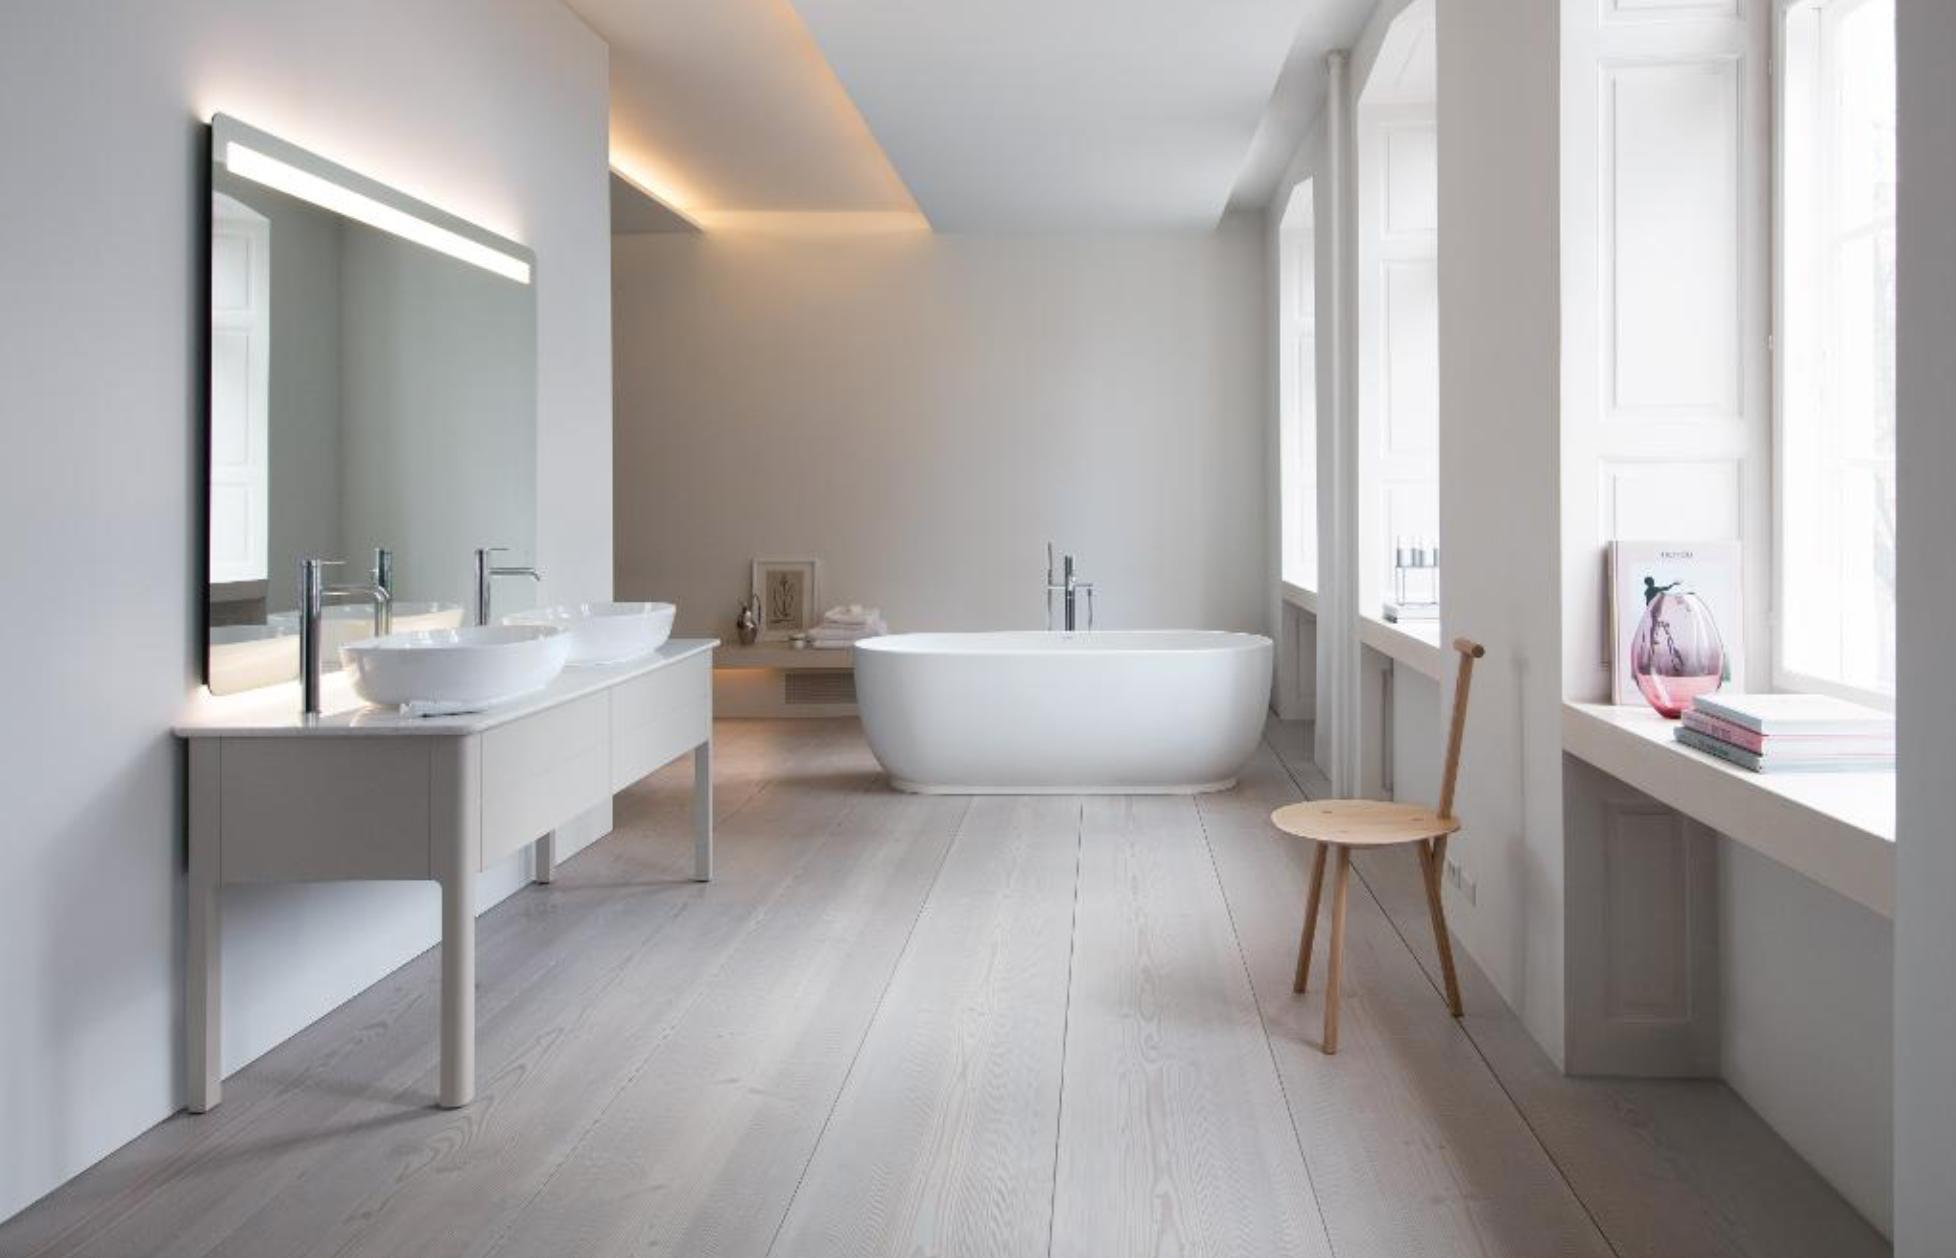 Fall In Luv With Duravit Modern Luxury Bathroom Bathroom Furniture Design Ikea Bathroom Accessories